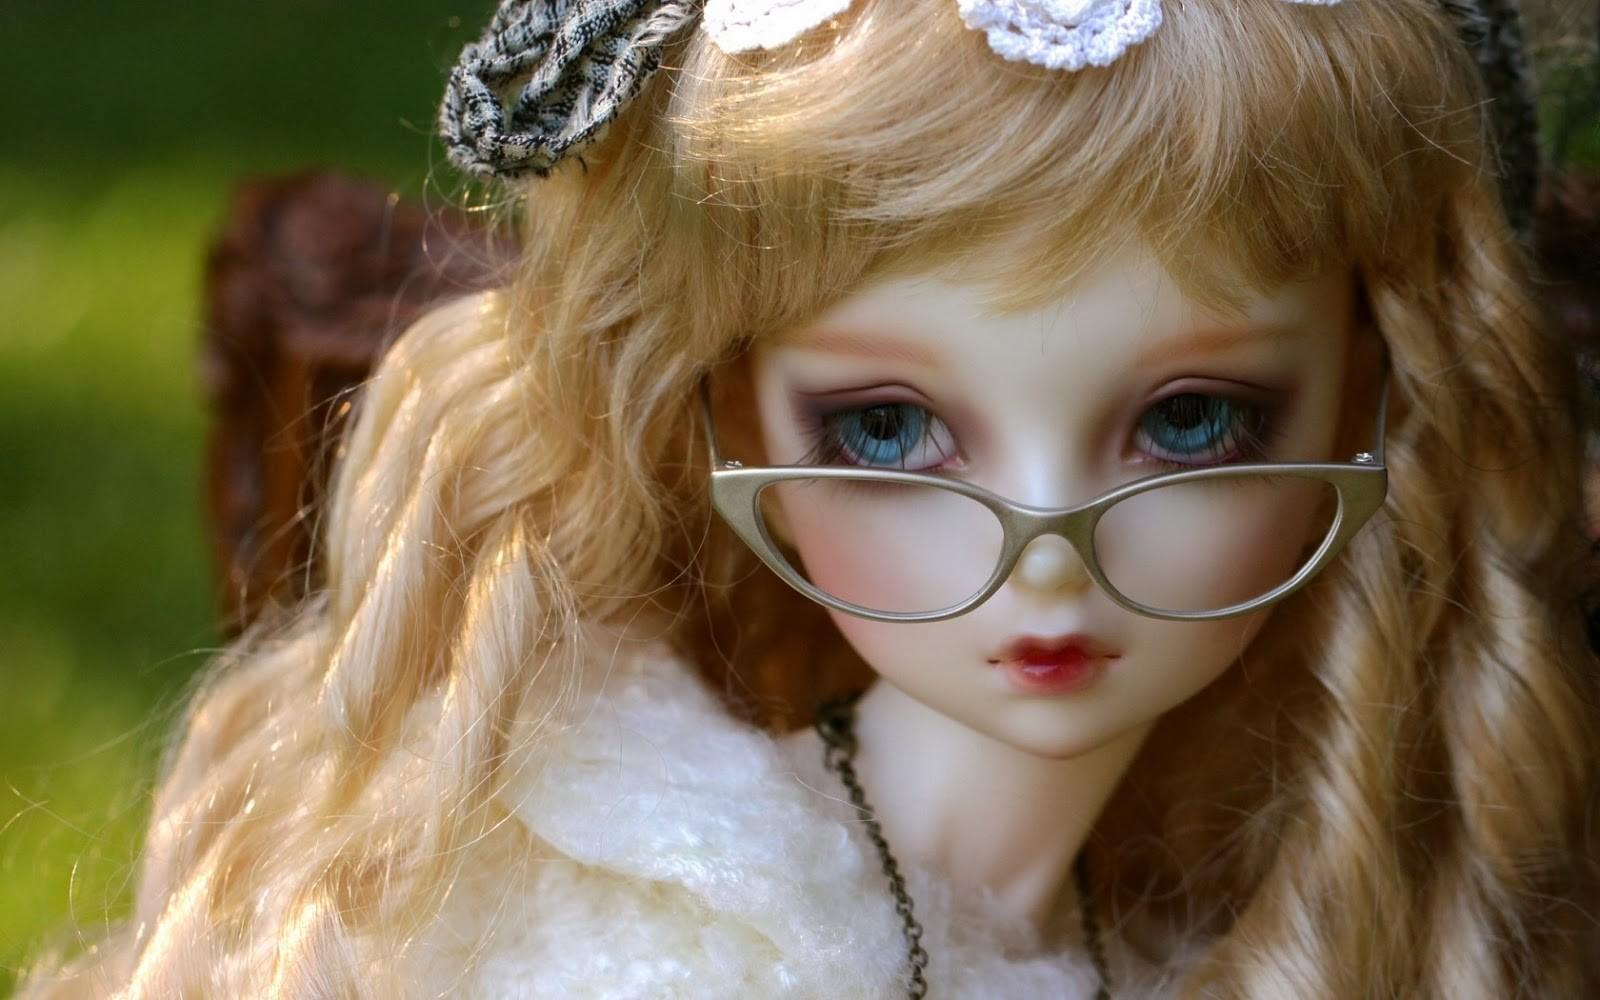 Most Inspiring Wallpaper Love Barbie - eZgLGD  Pic_573977.jpg